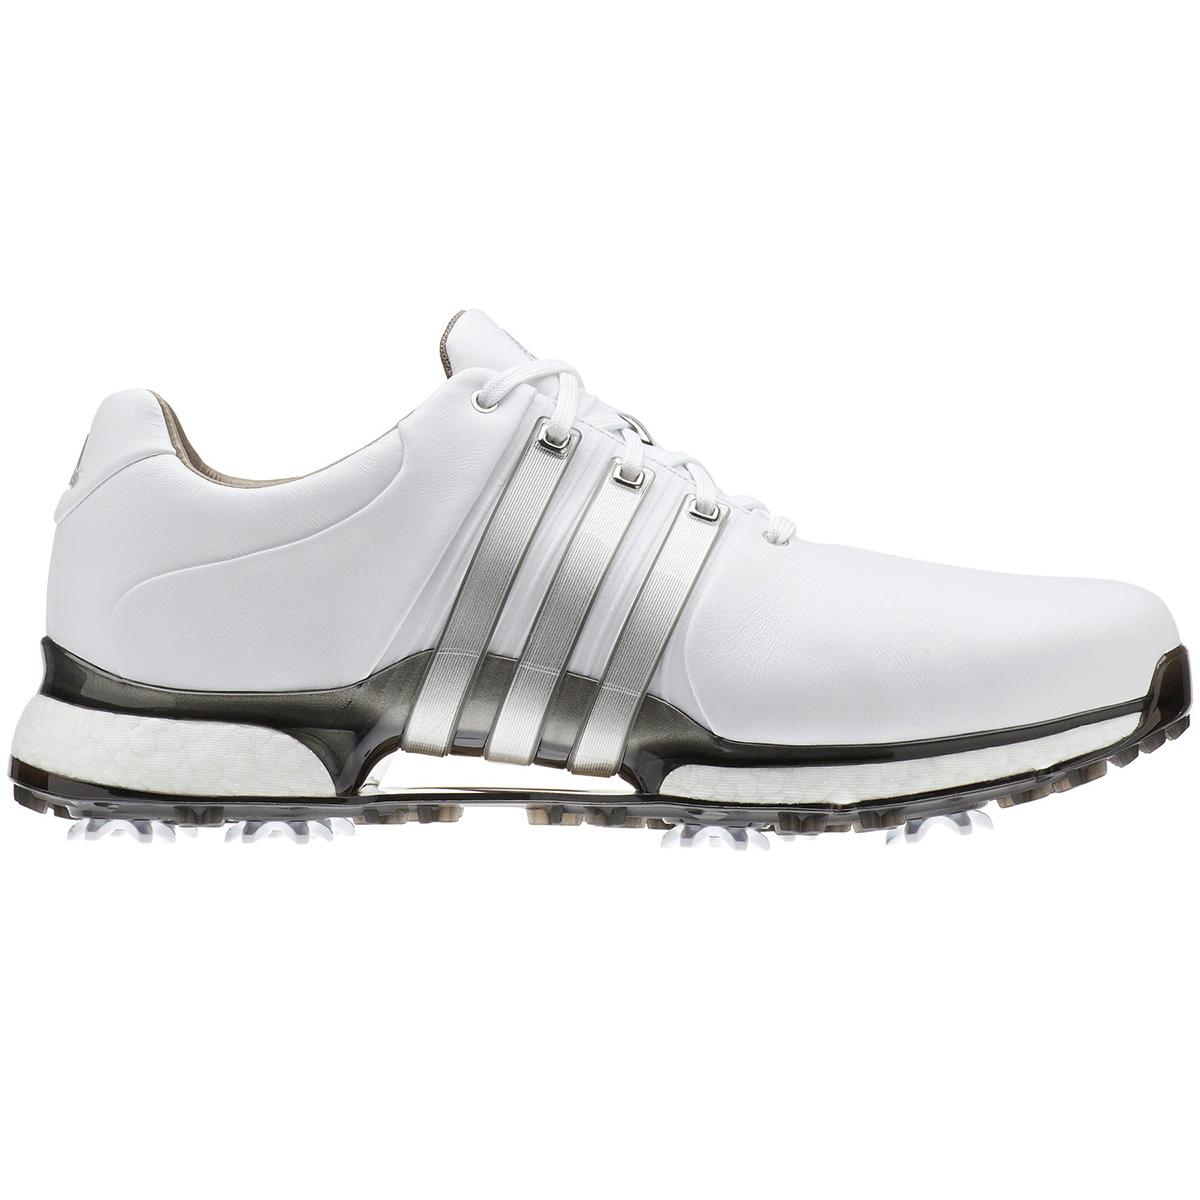 adidas Golf Tour 360 XT Shoe from american golf